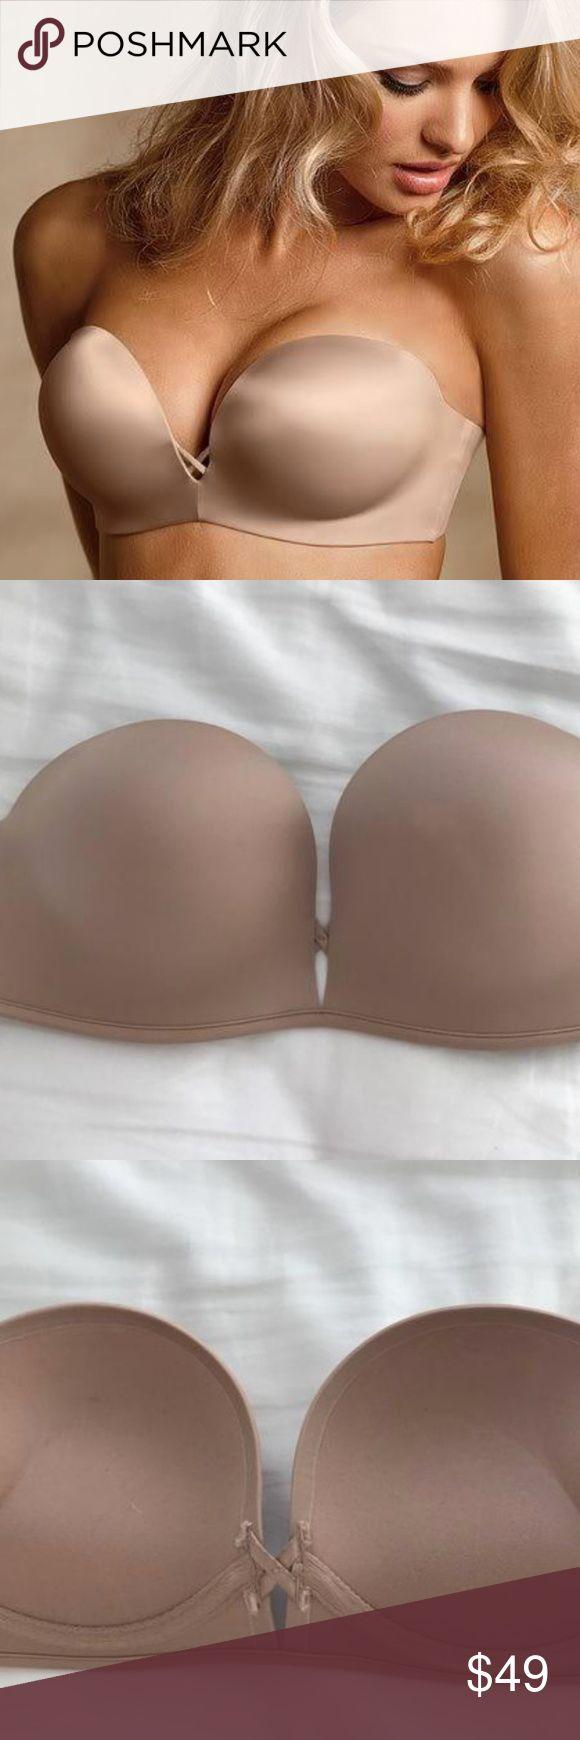 Victorias Secret Strapless Womens Push Up Bra 34B Nude